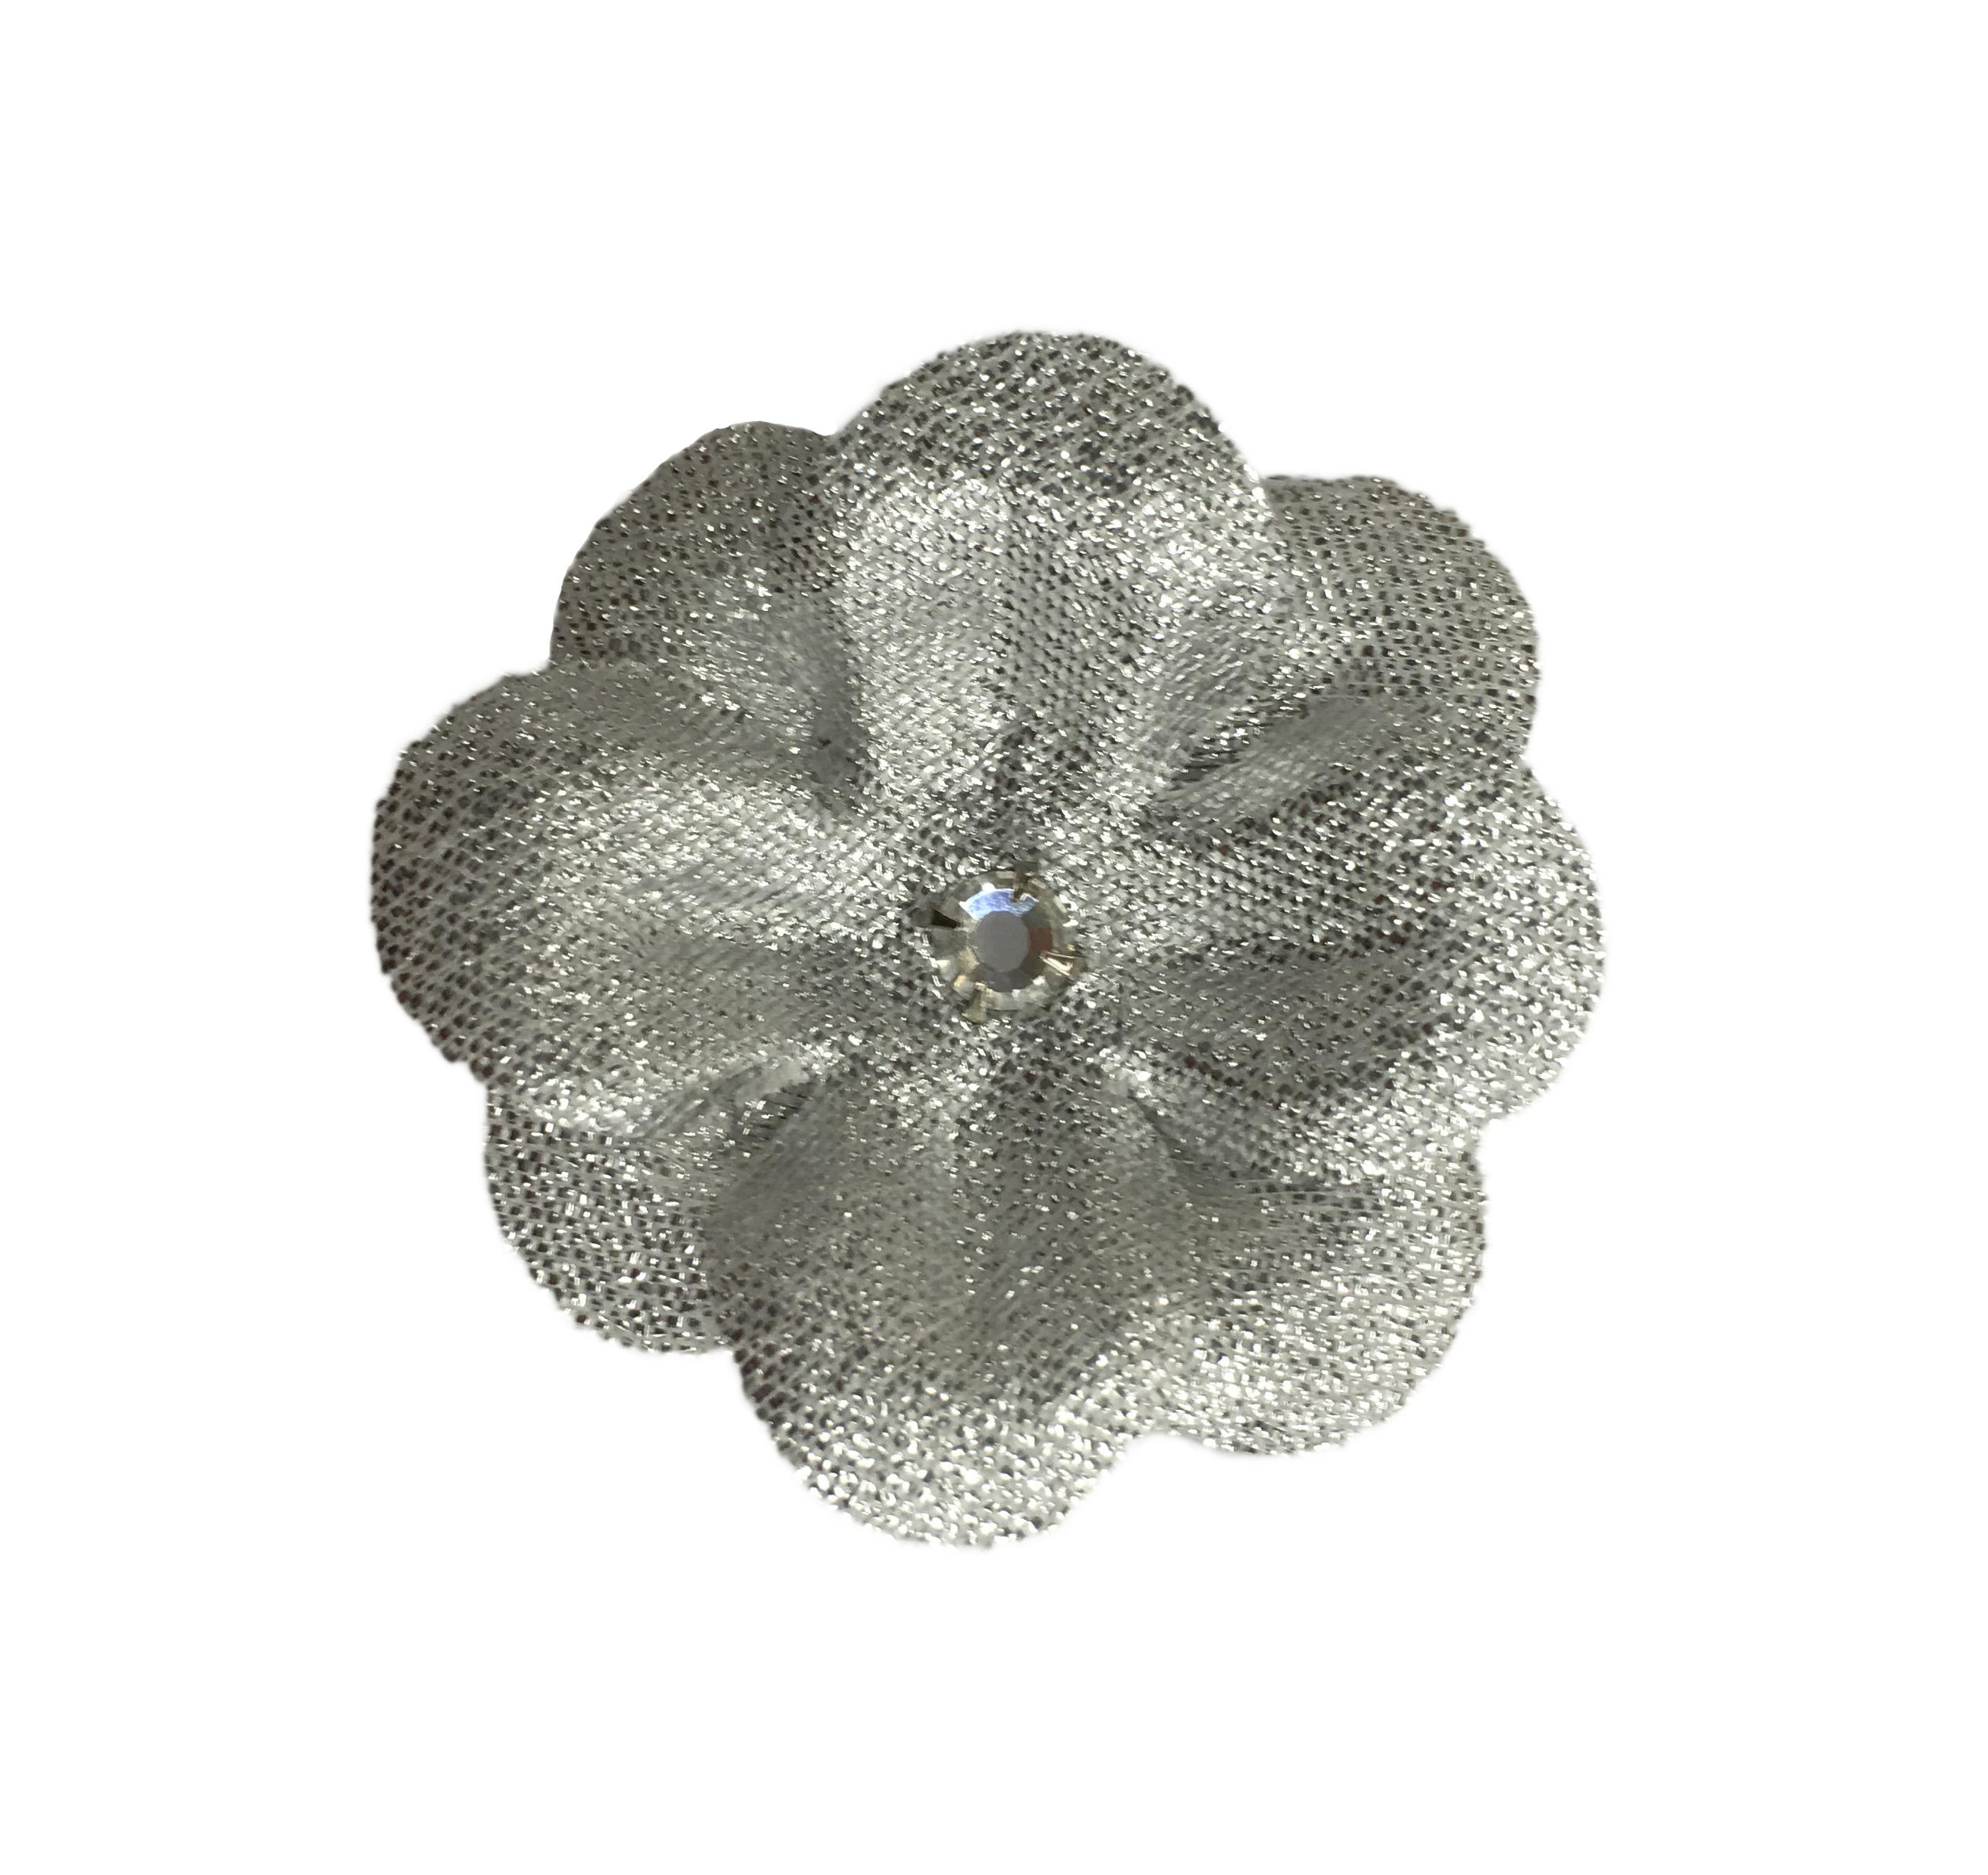 15 Silver Silk Flower Clips Set Of 2 Ms Schmalberg